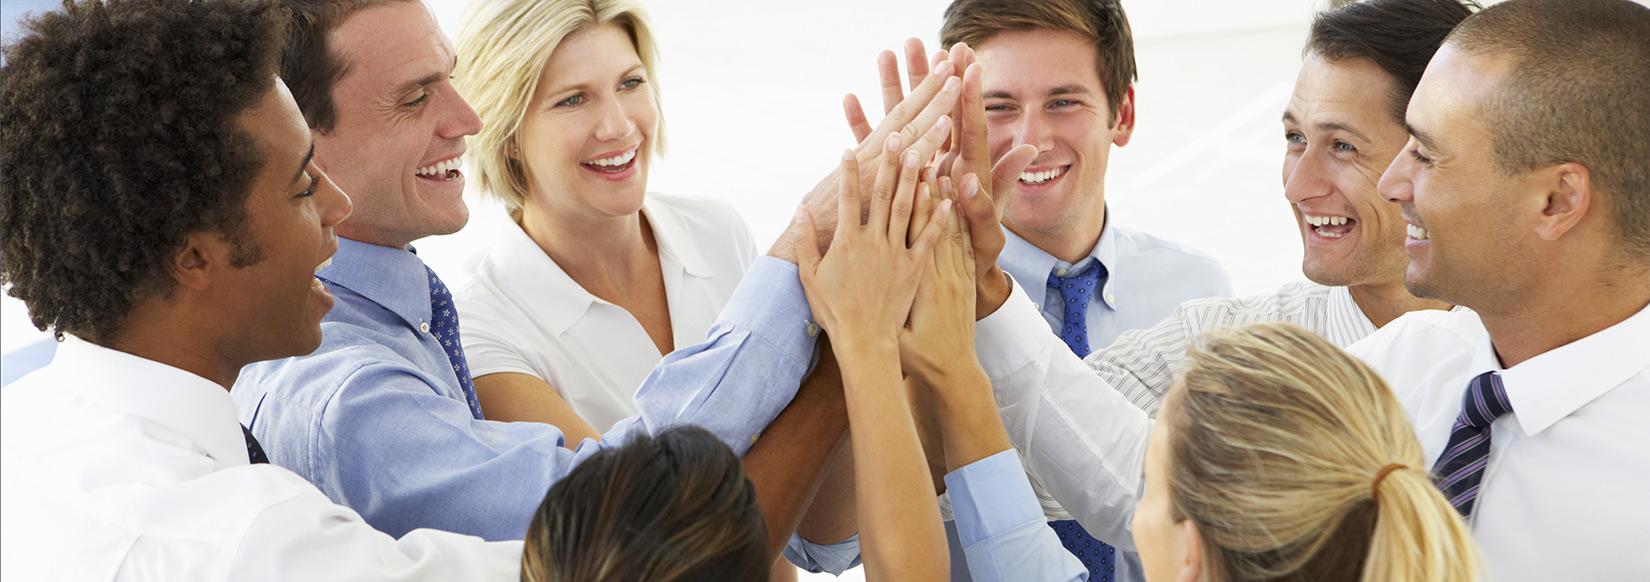 organiser-un-team-building-entreprise-nimes-